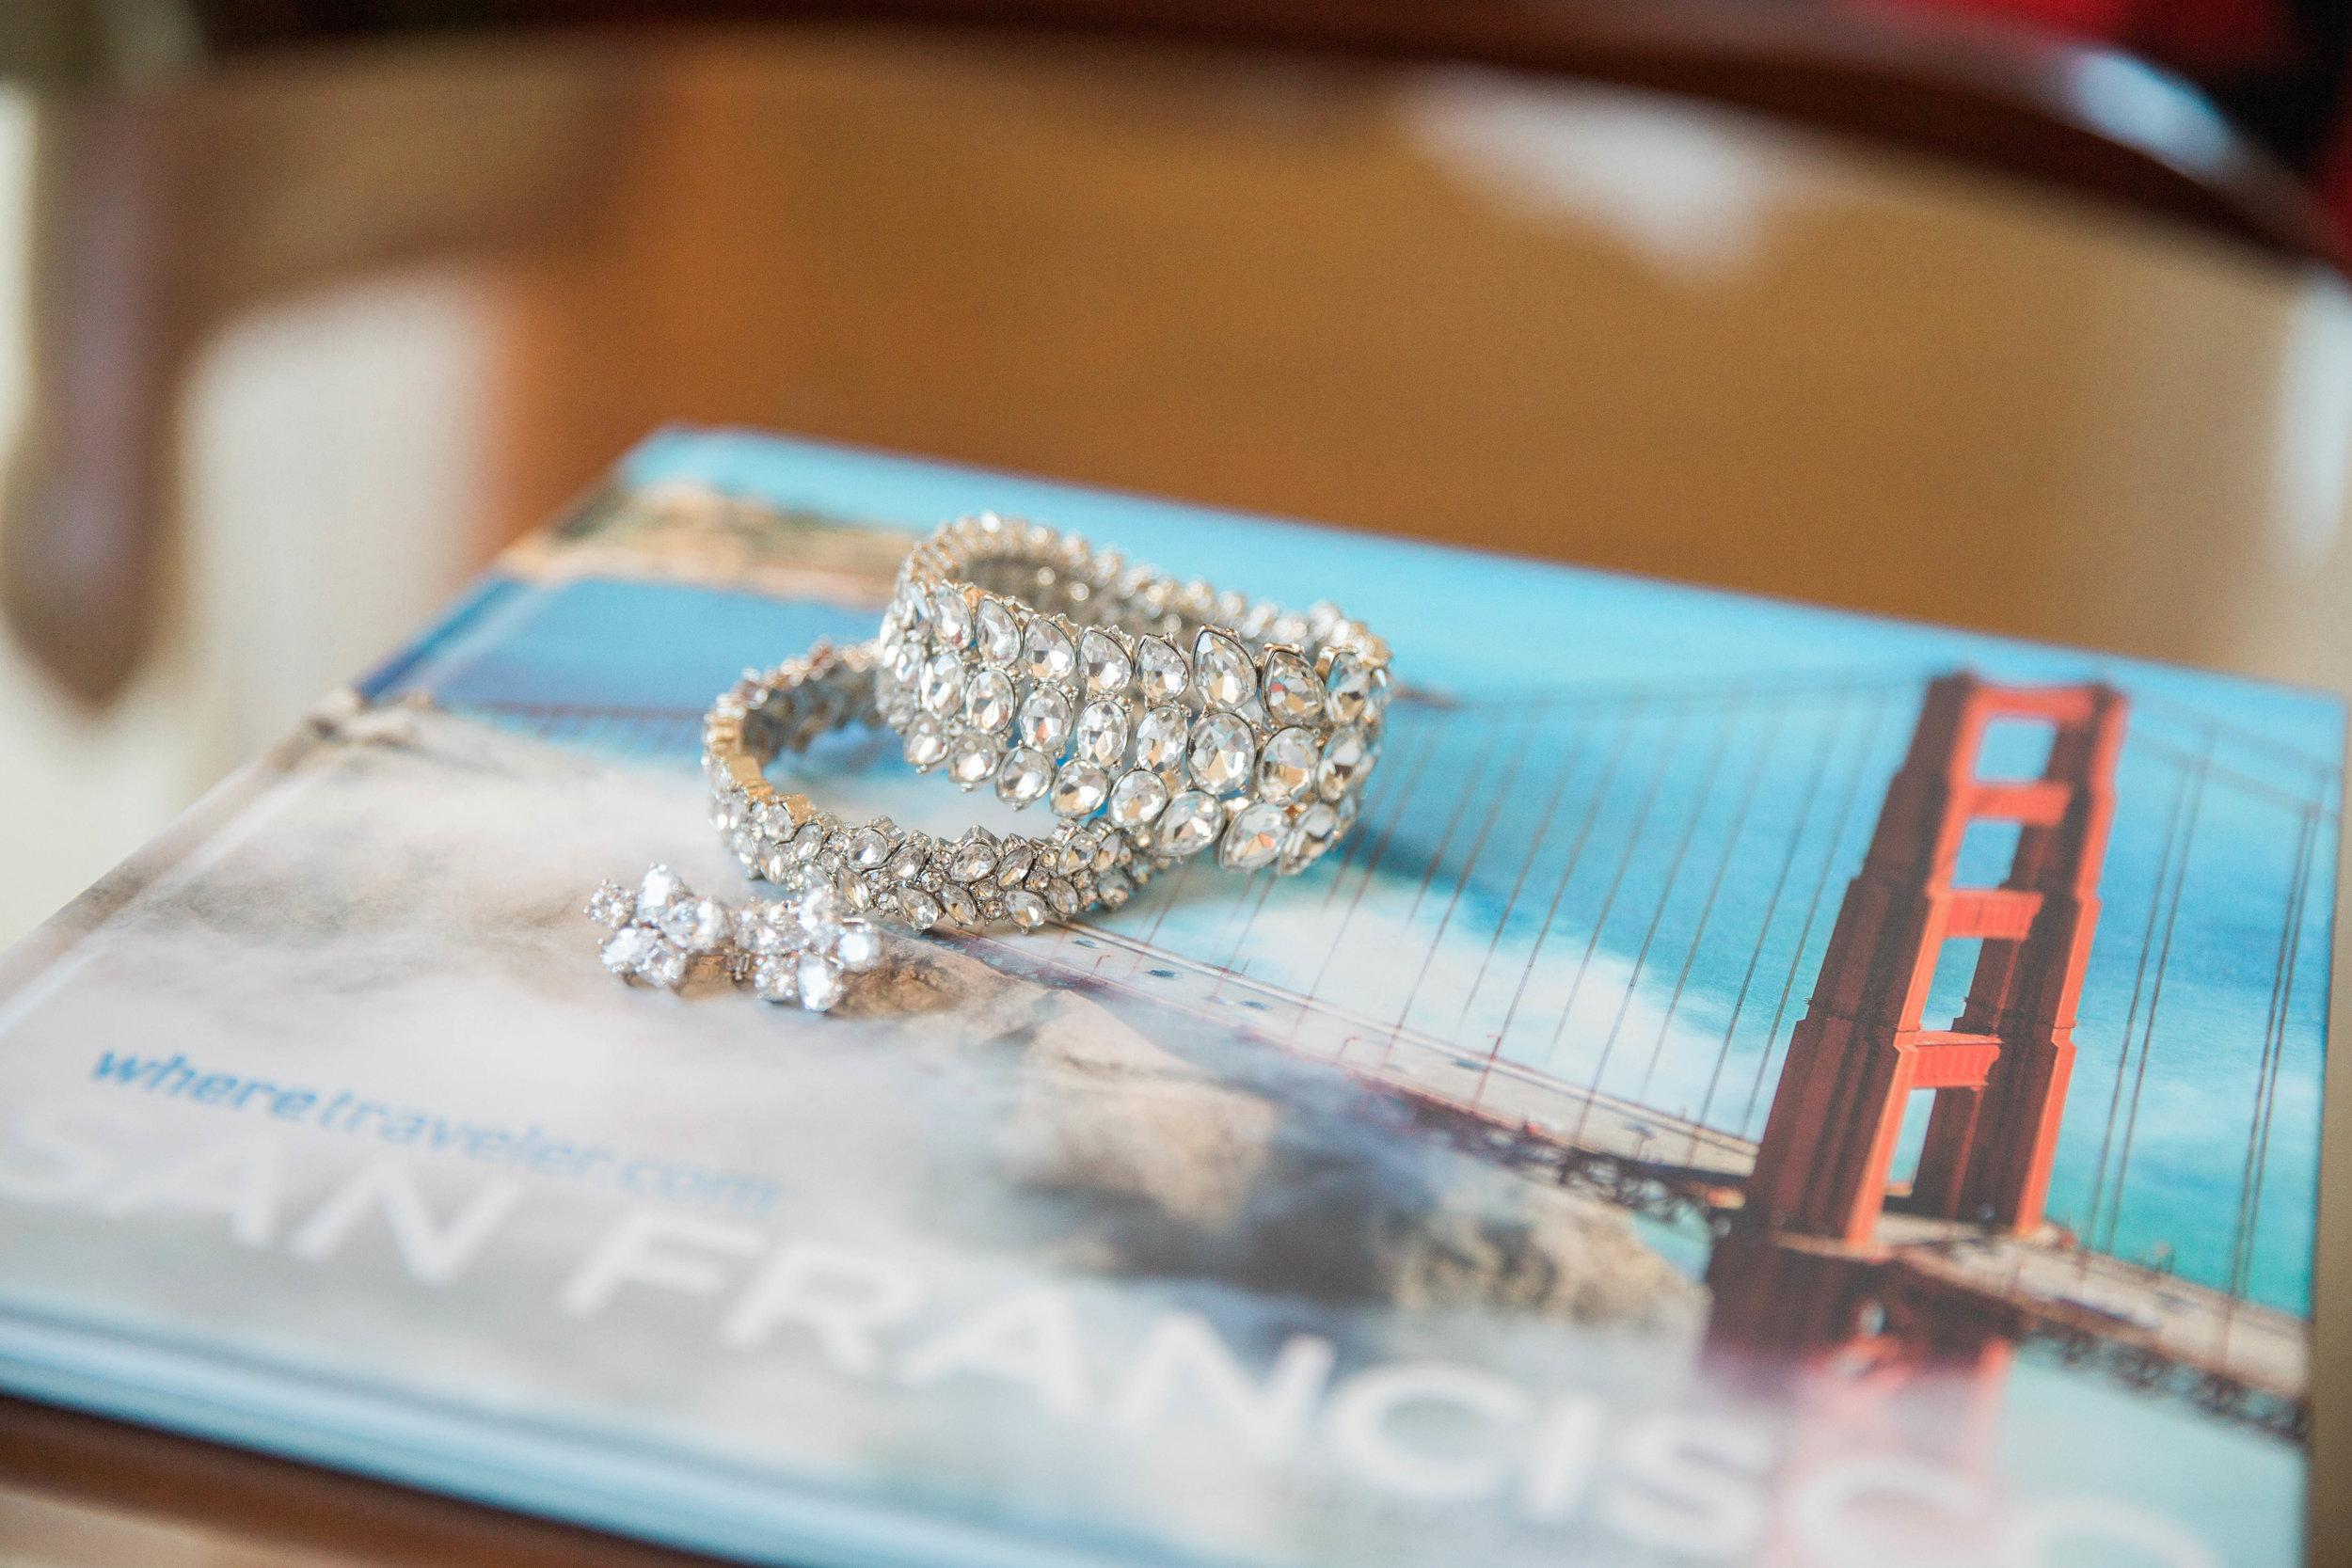 san-francisco-city-hall-wedding-kimberly-macdonald-photography105 copy.jpg